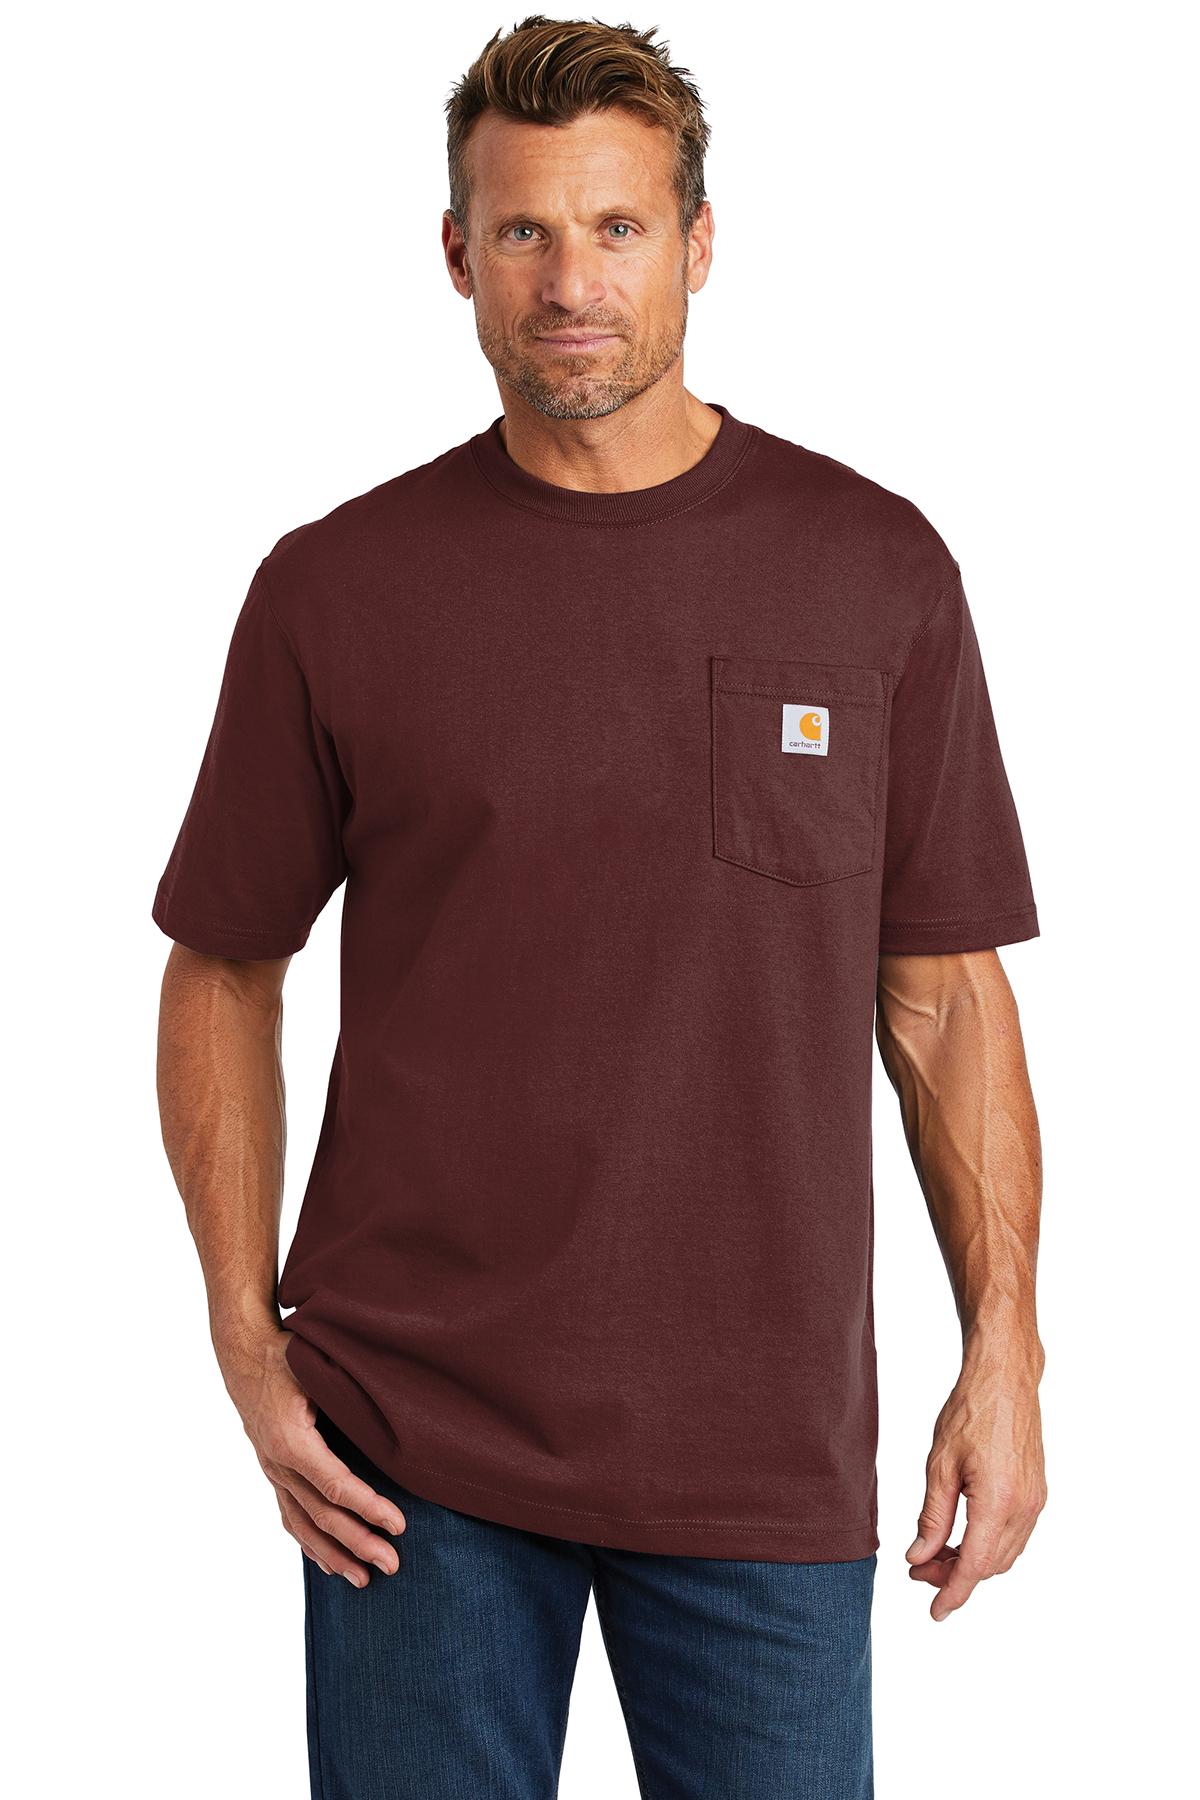 Carhartt® CTK87 - Workwear Pocket Short Sleeve T-Shirt